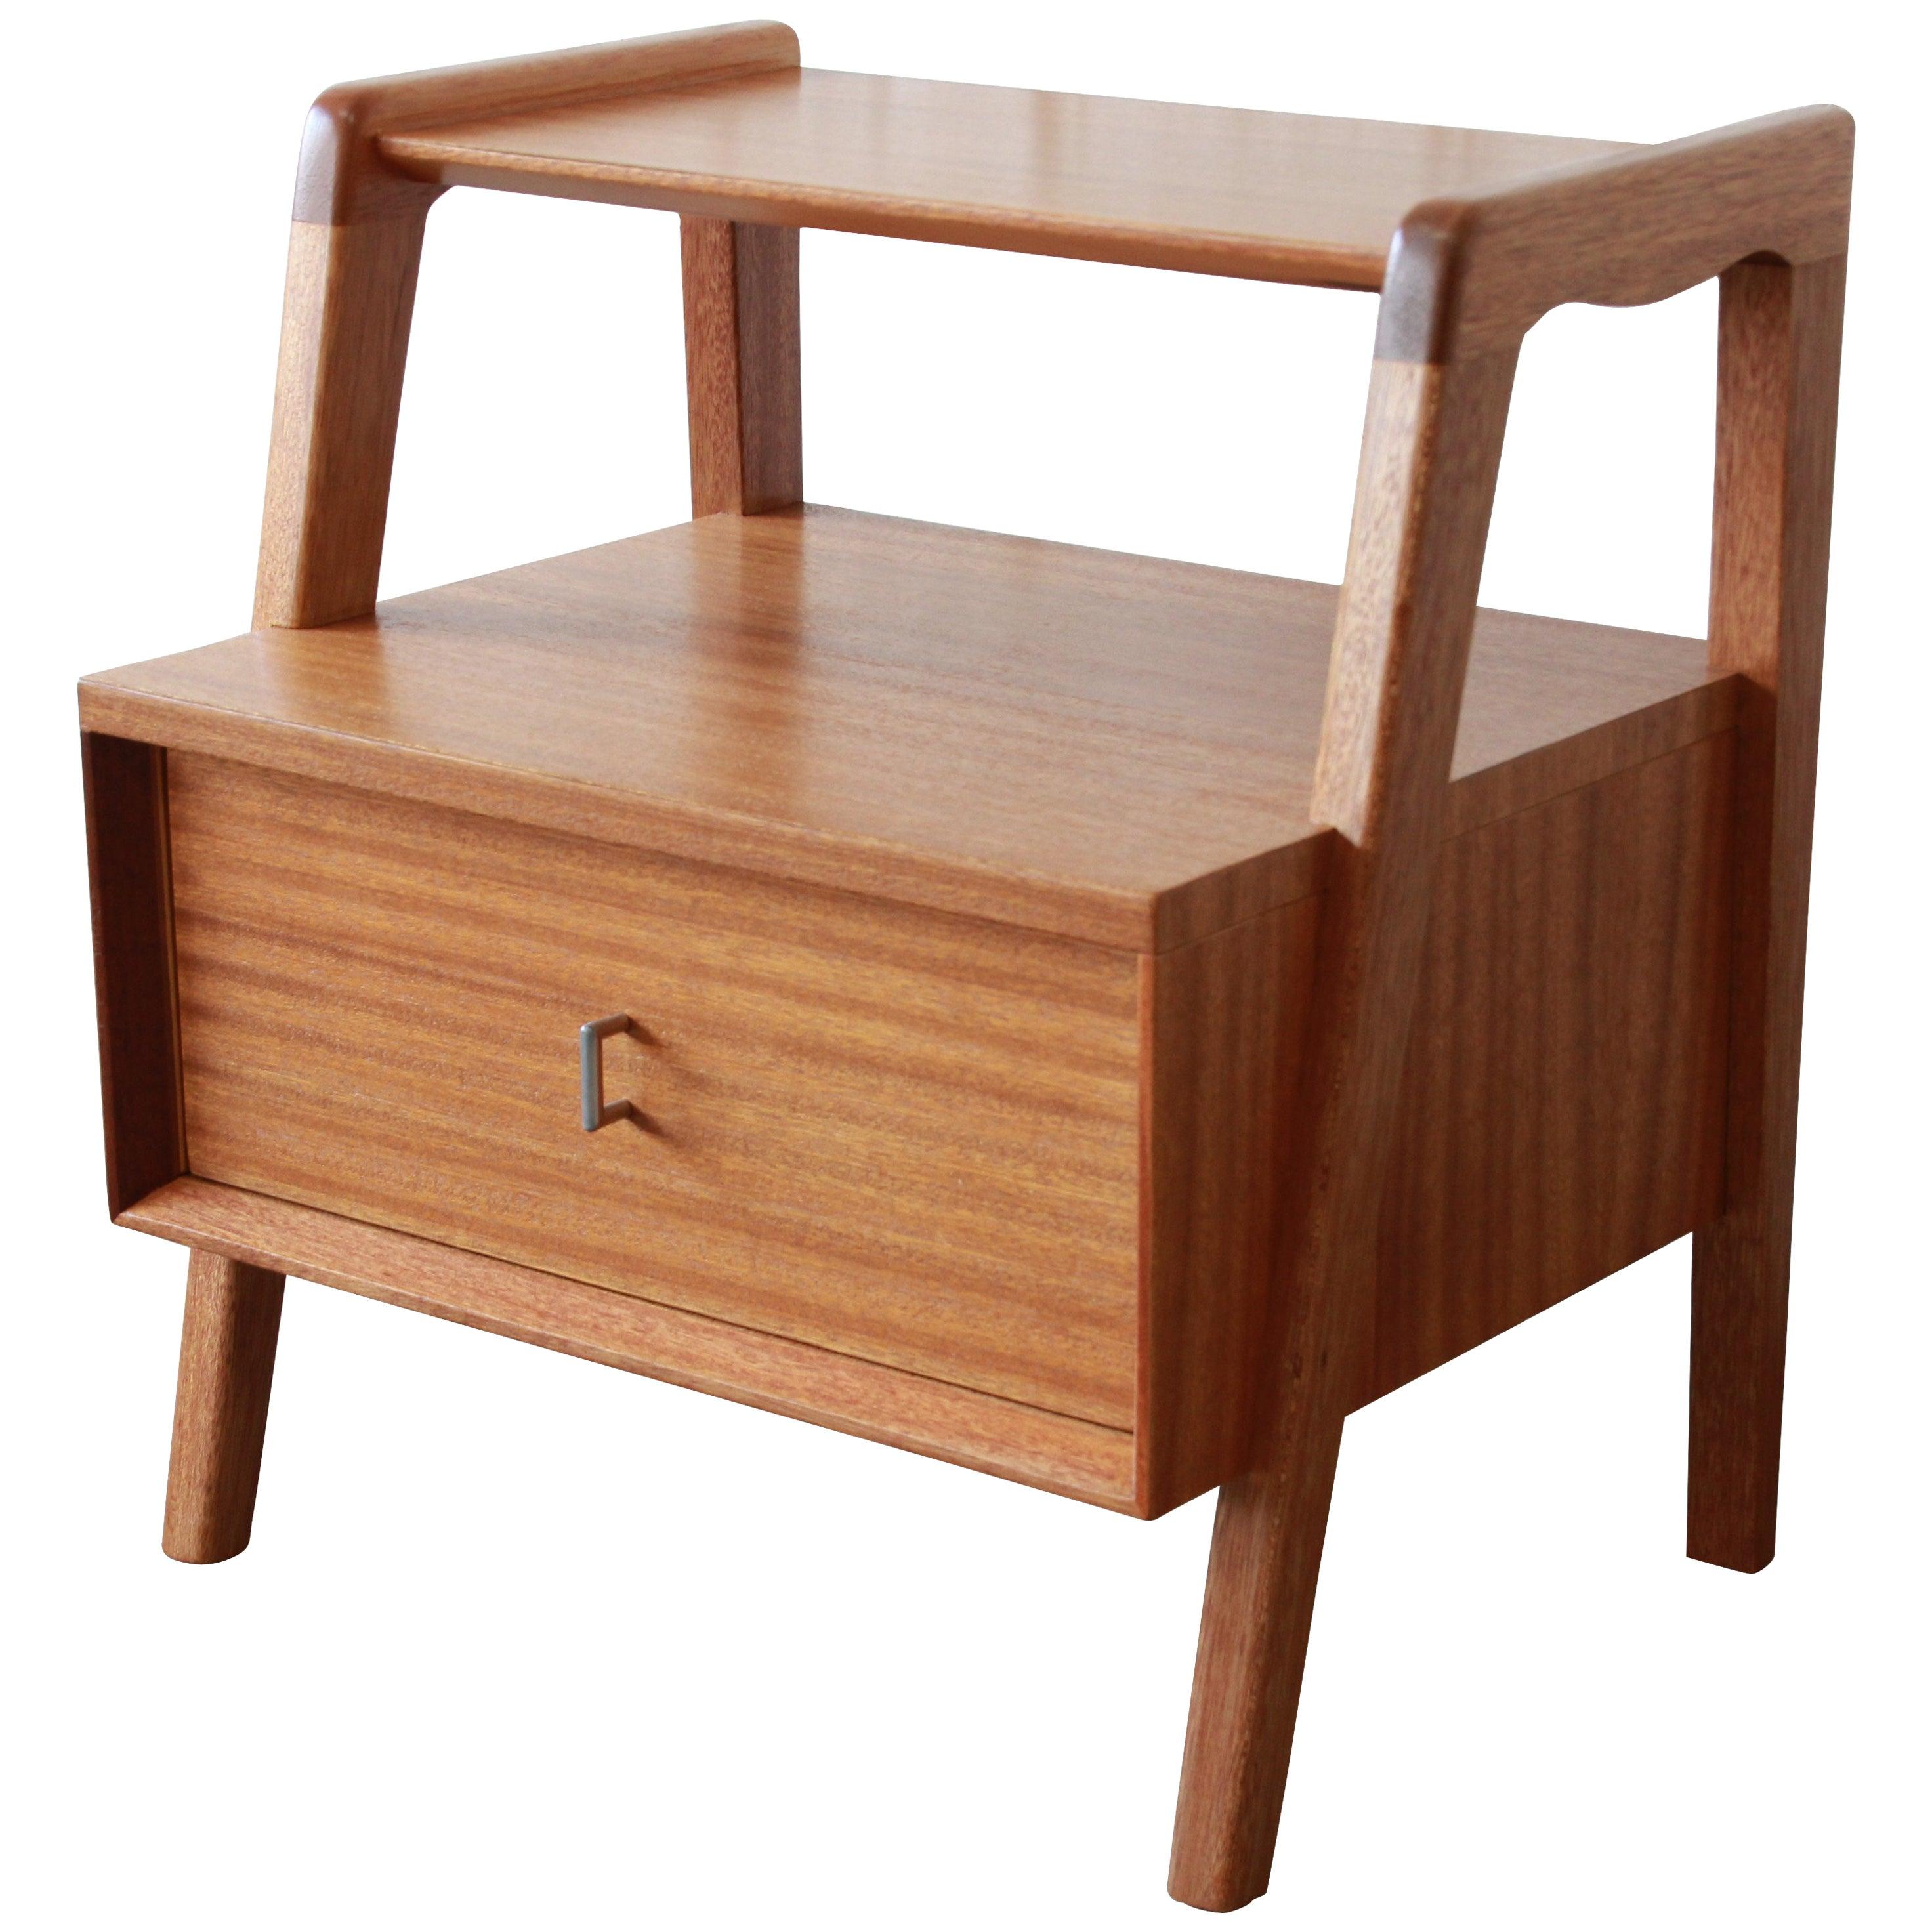 Paul Laszlo for Brown Saltman Mid-Century Modern Nightstand or Side Table